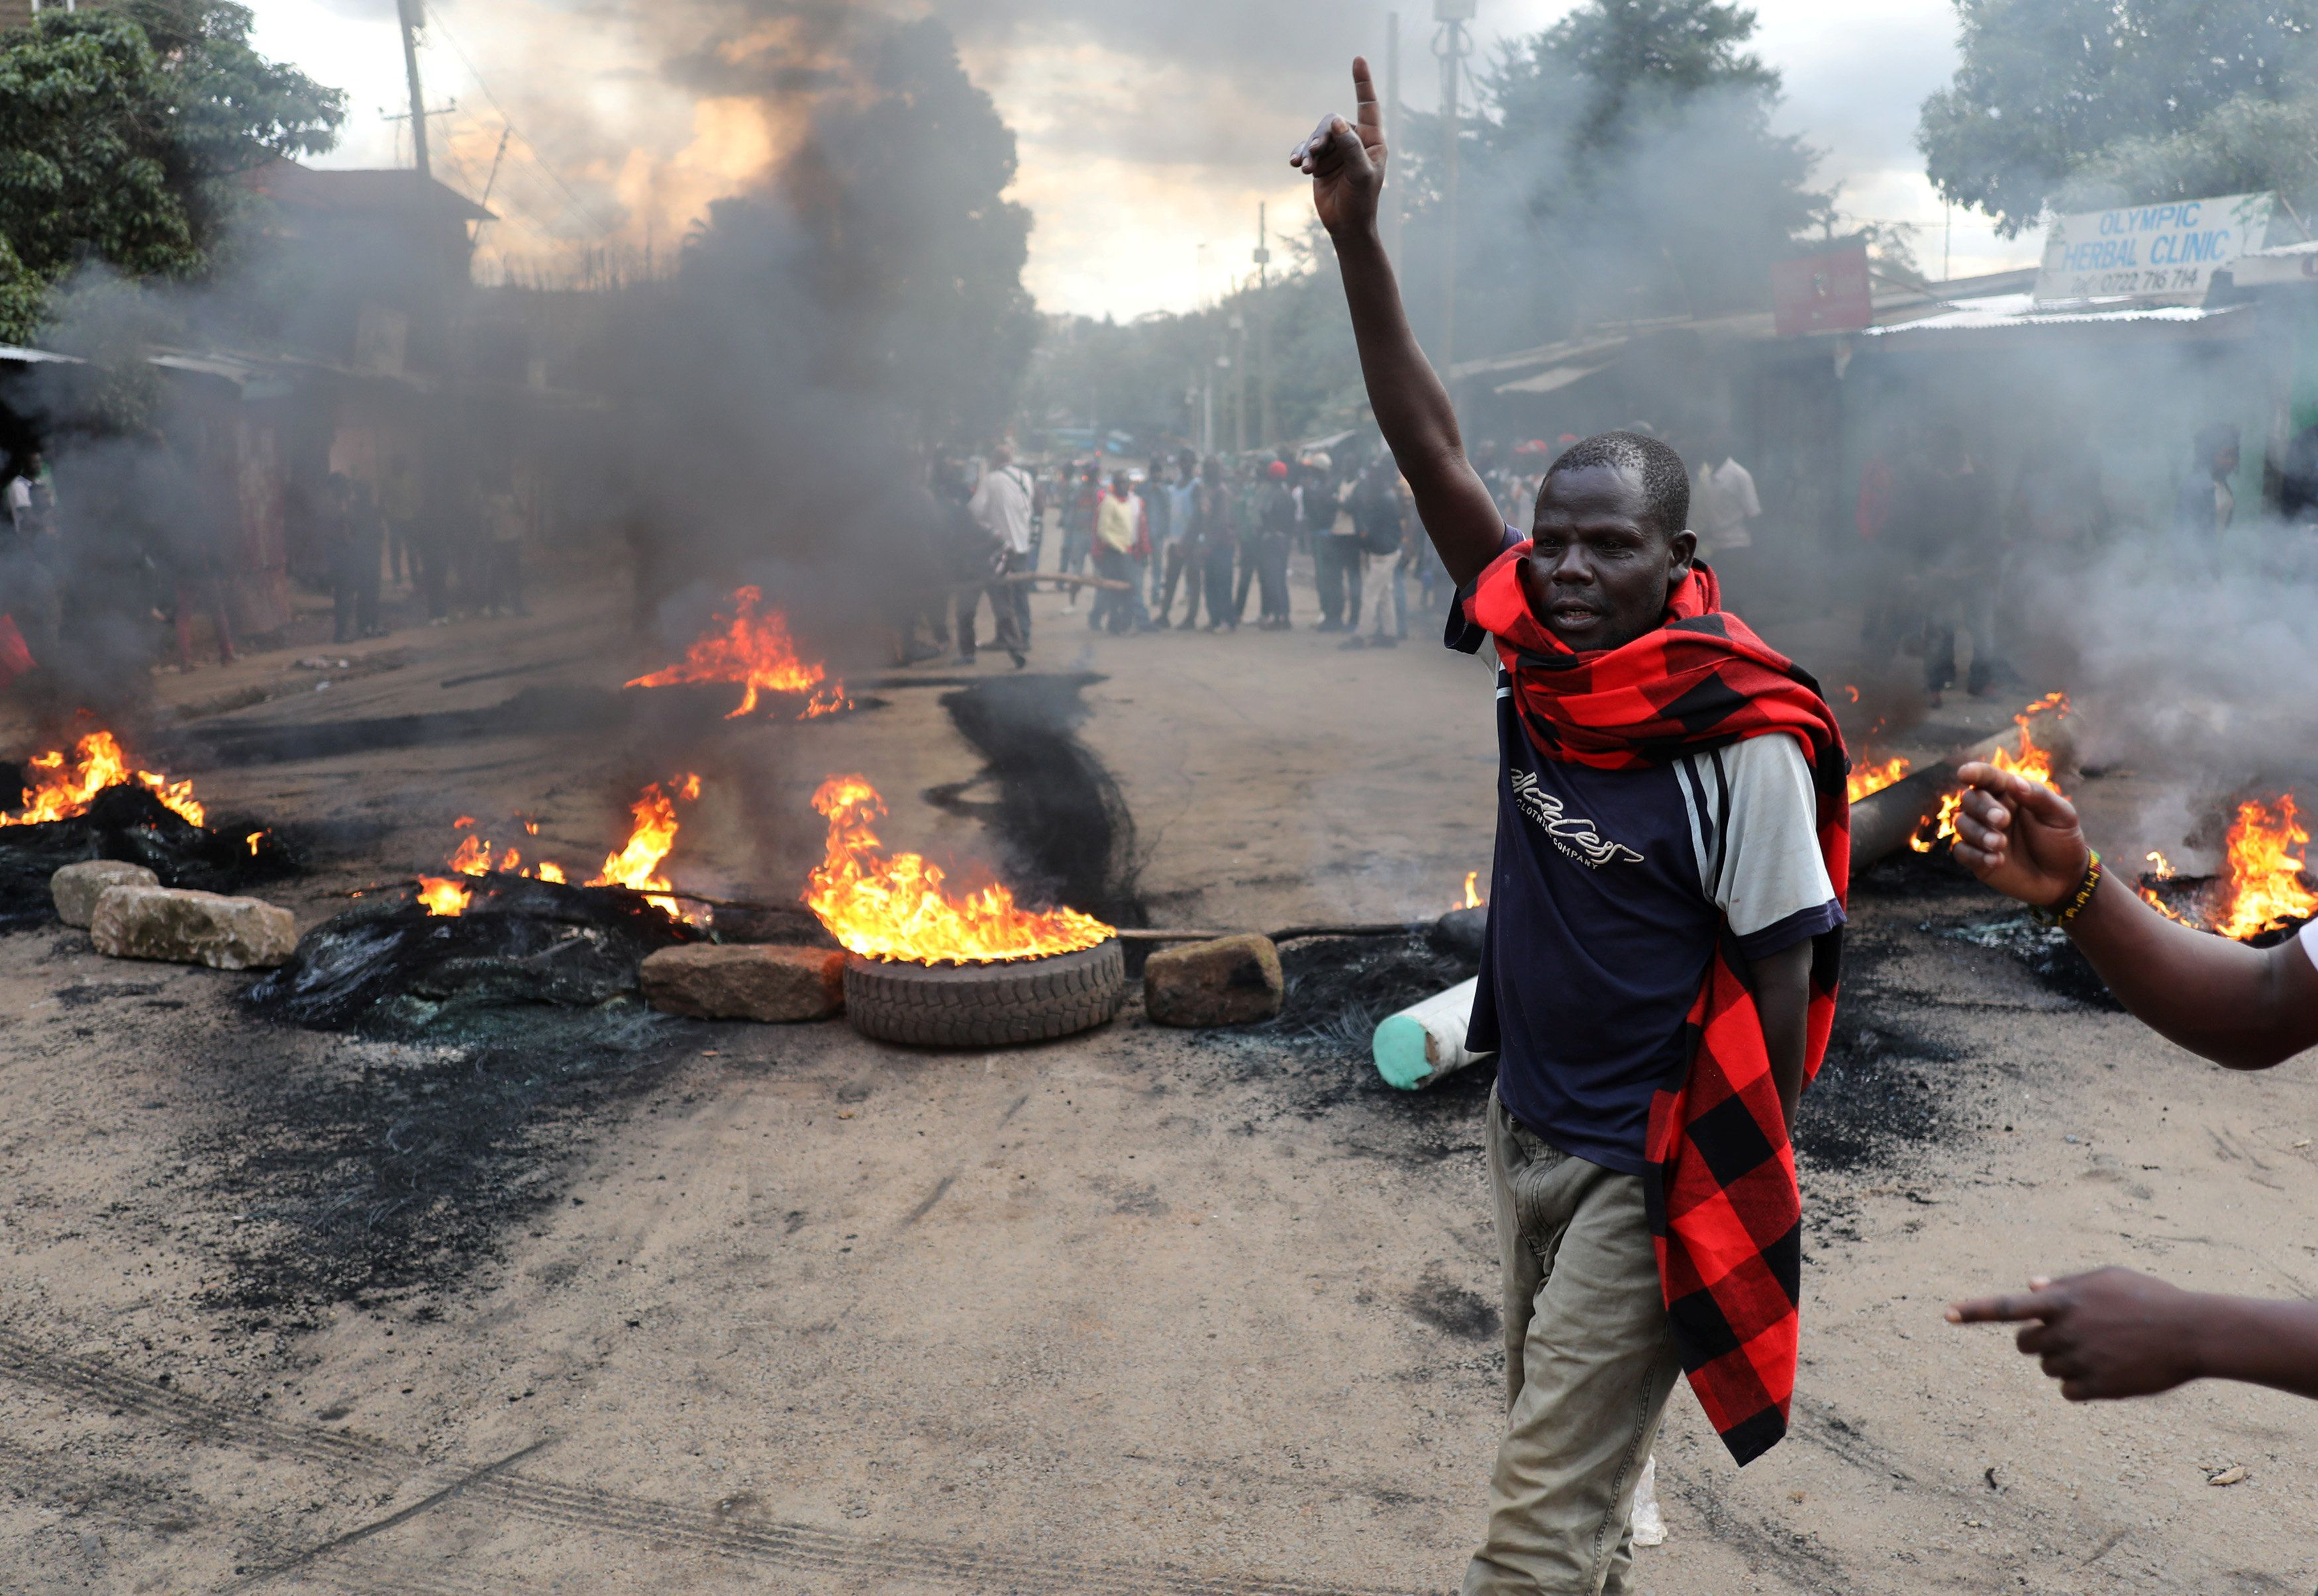 An opposition supporter gestures in front of a burned barricade in Kibera slum in Nairobi, Kenya October 25, 2017.